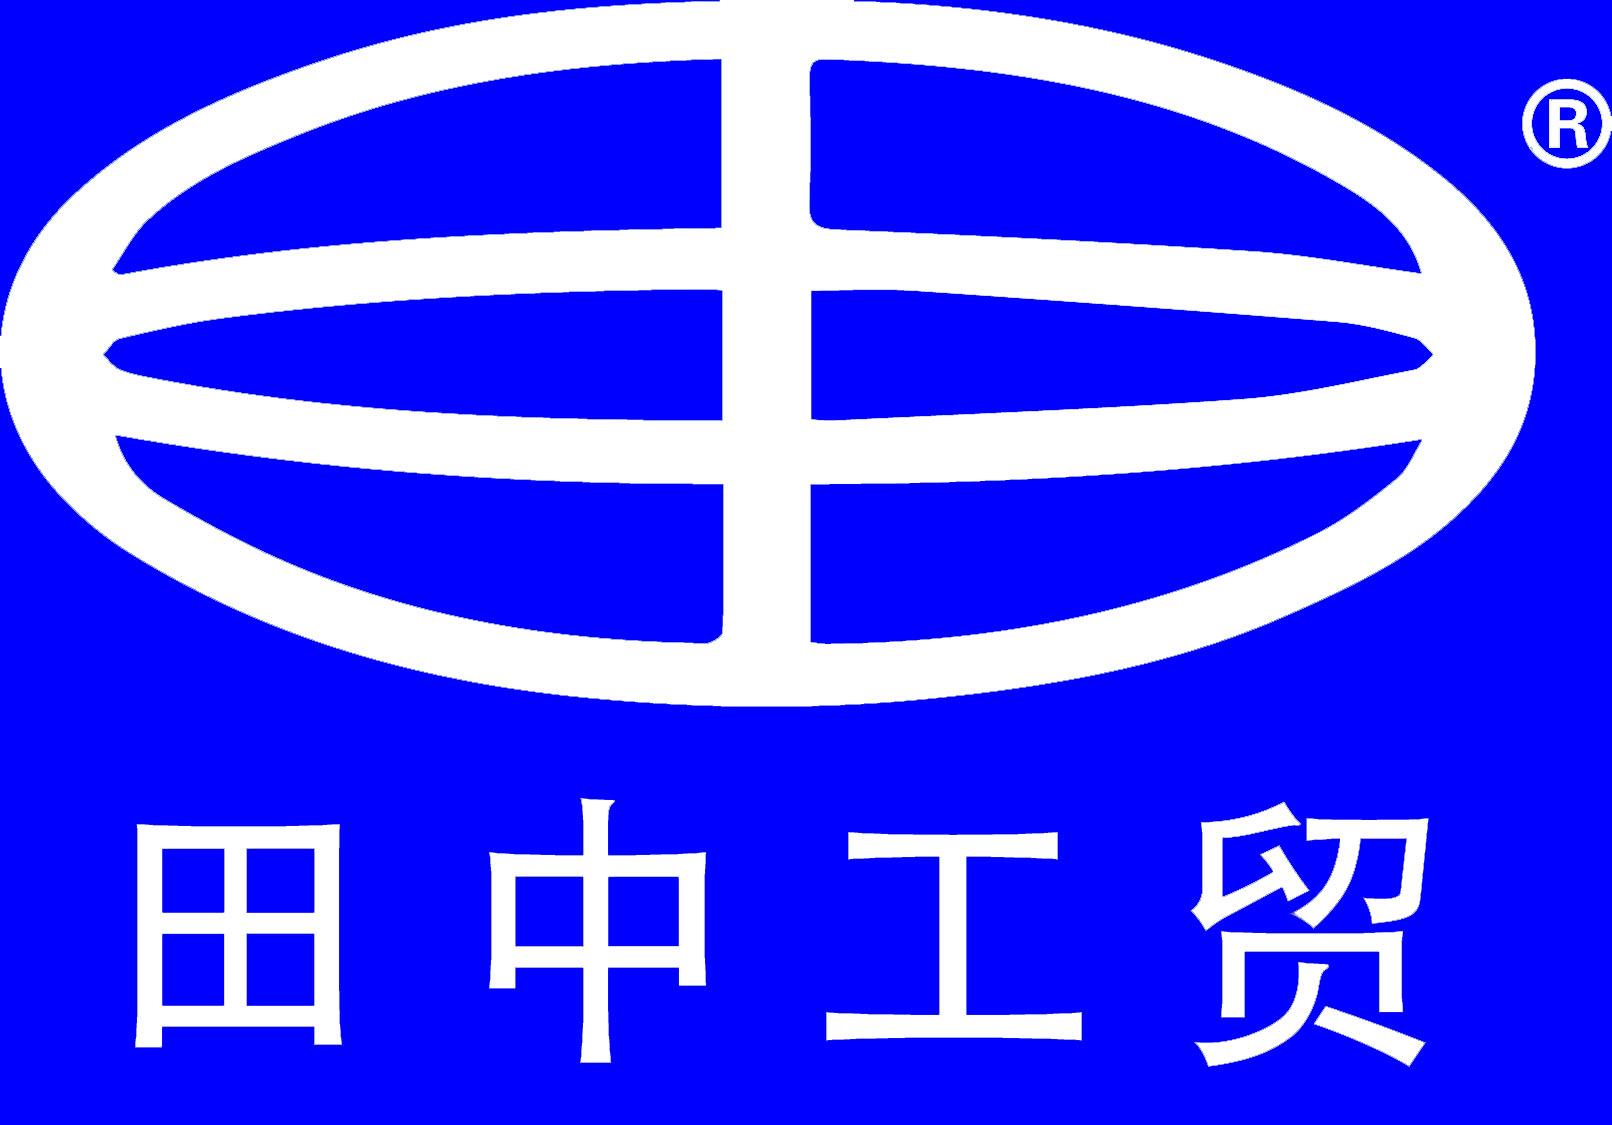 logo 标识 标志 设计 图标 1612_1125